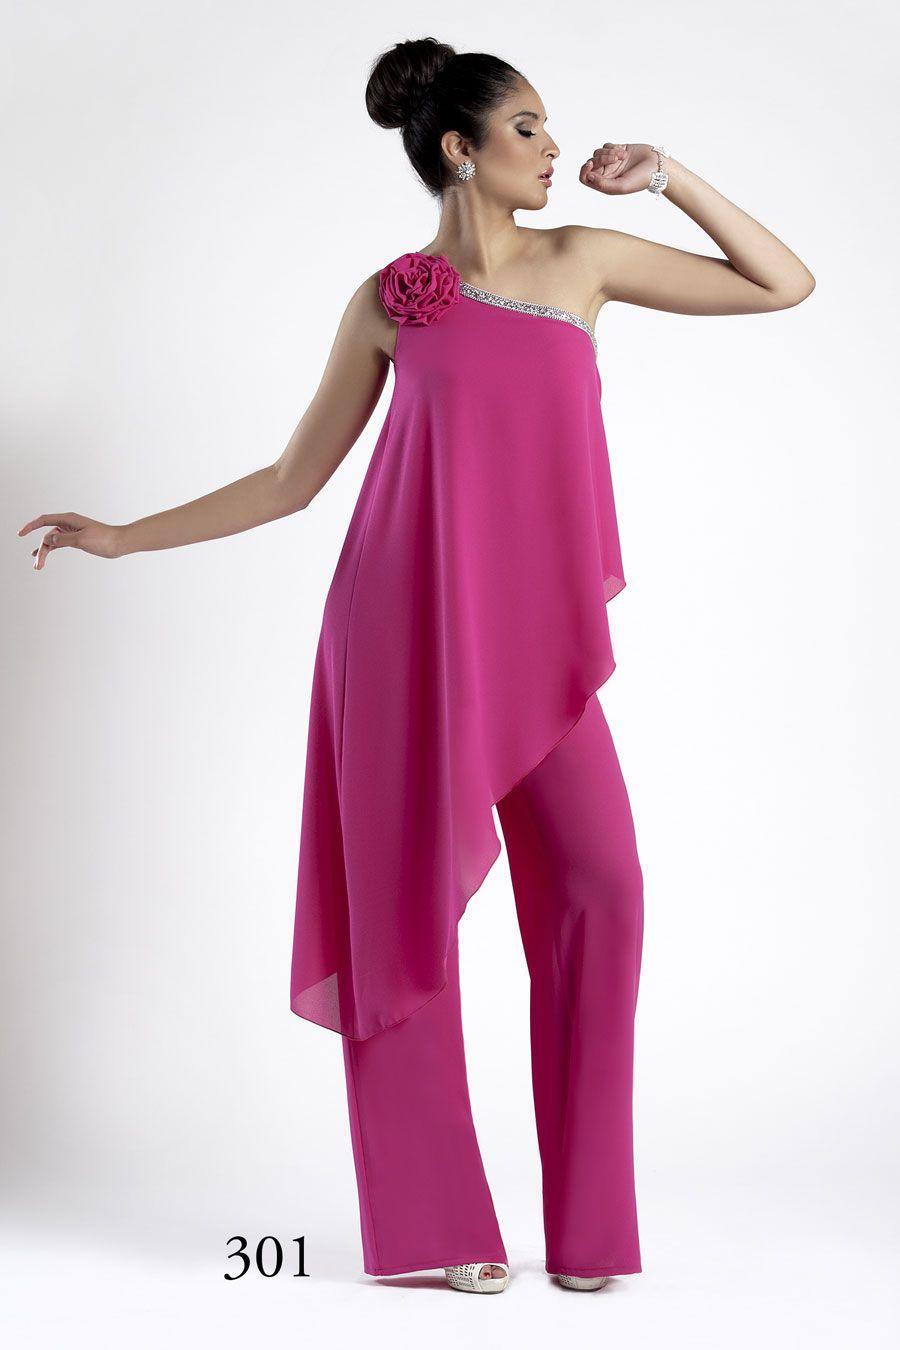 Monos de fiesta o jumpsuit: monos pero que muy monos | Fashion shops ...